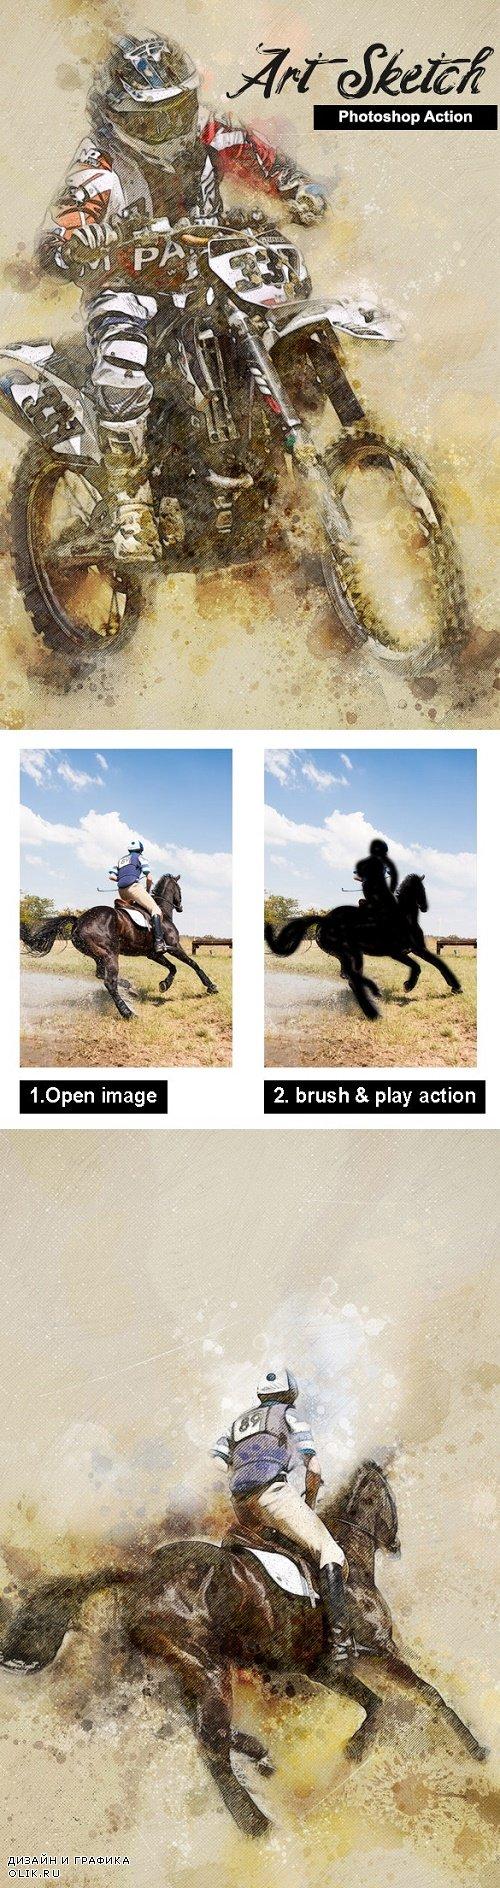 Amazing Art Sketch Photoshop Action 23698629